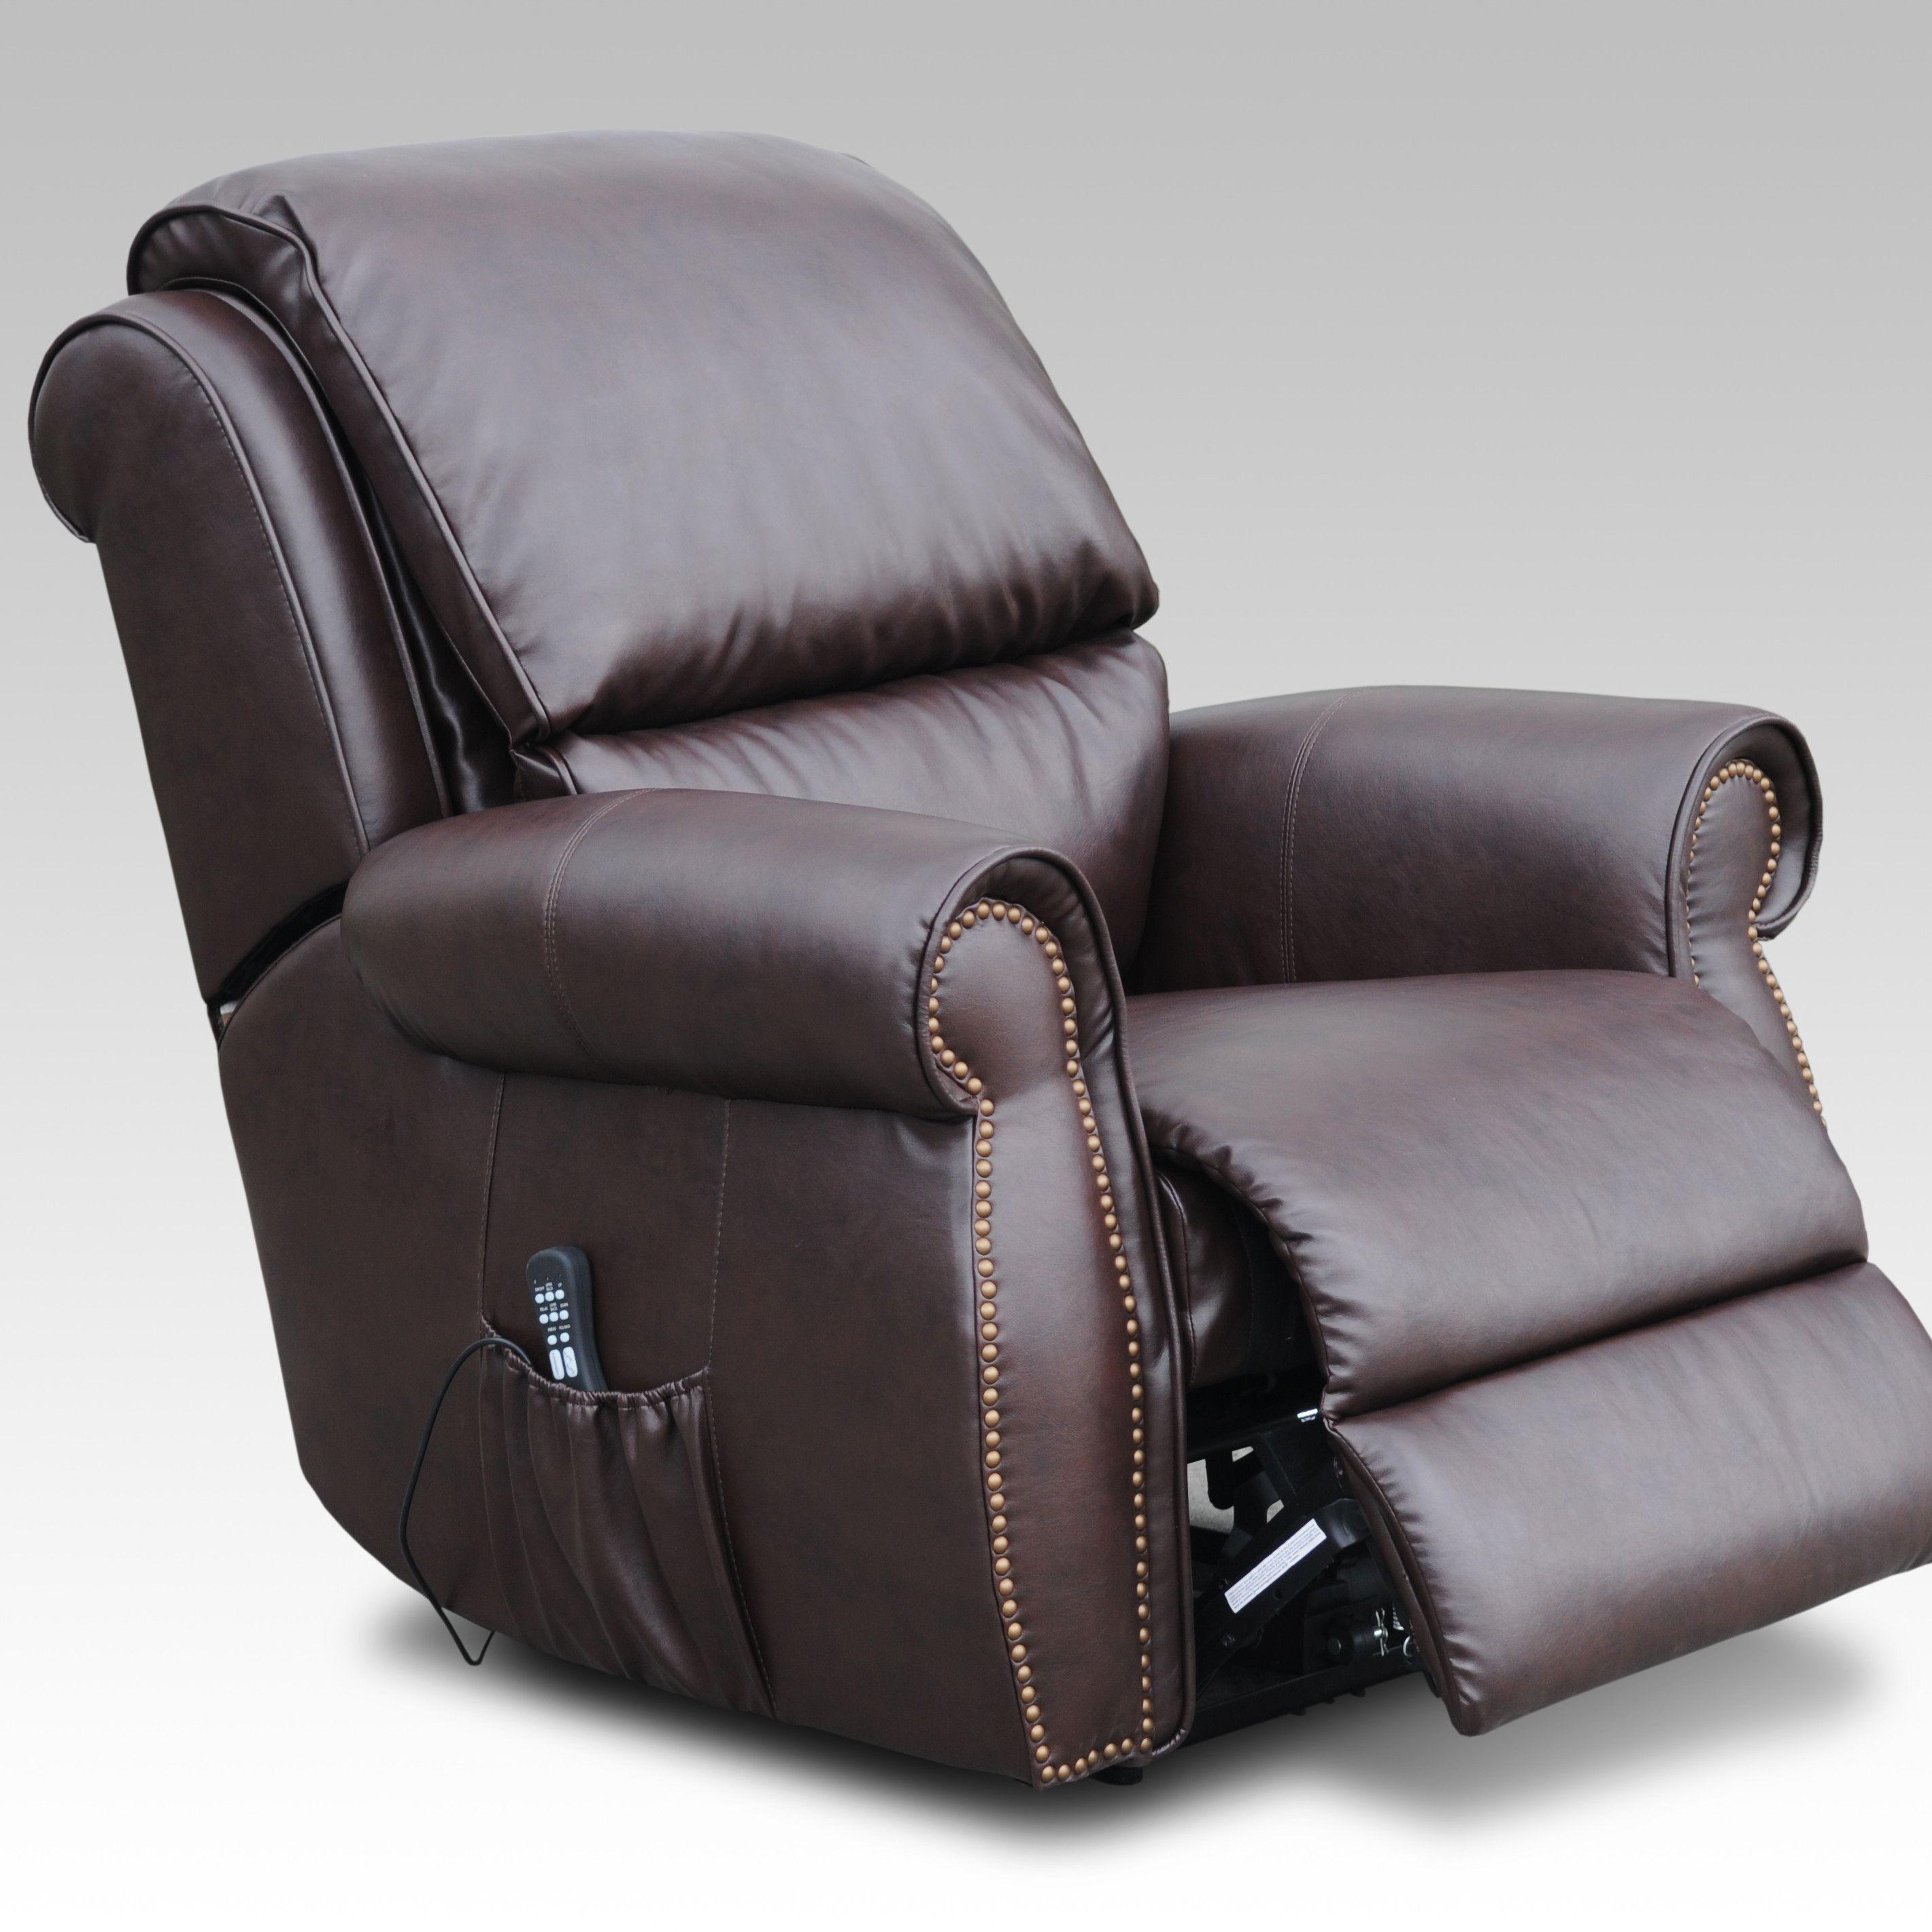 Ac pacific reclining massage chair recliner chair